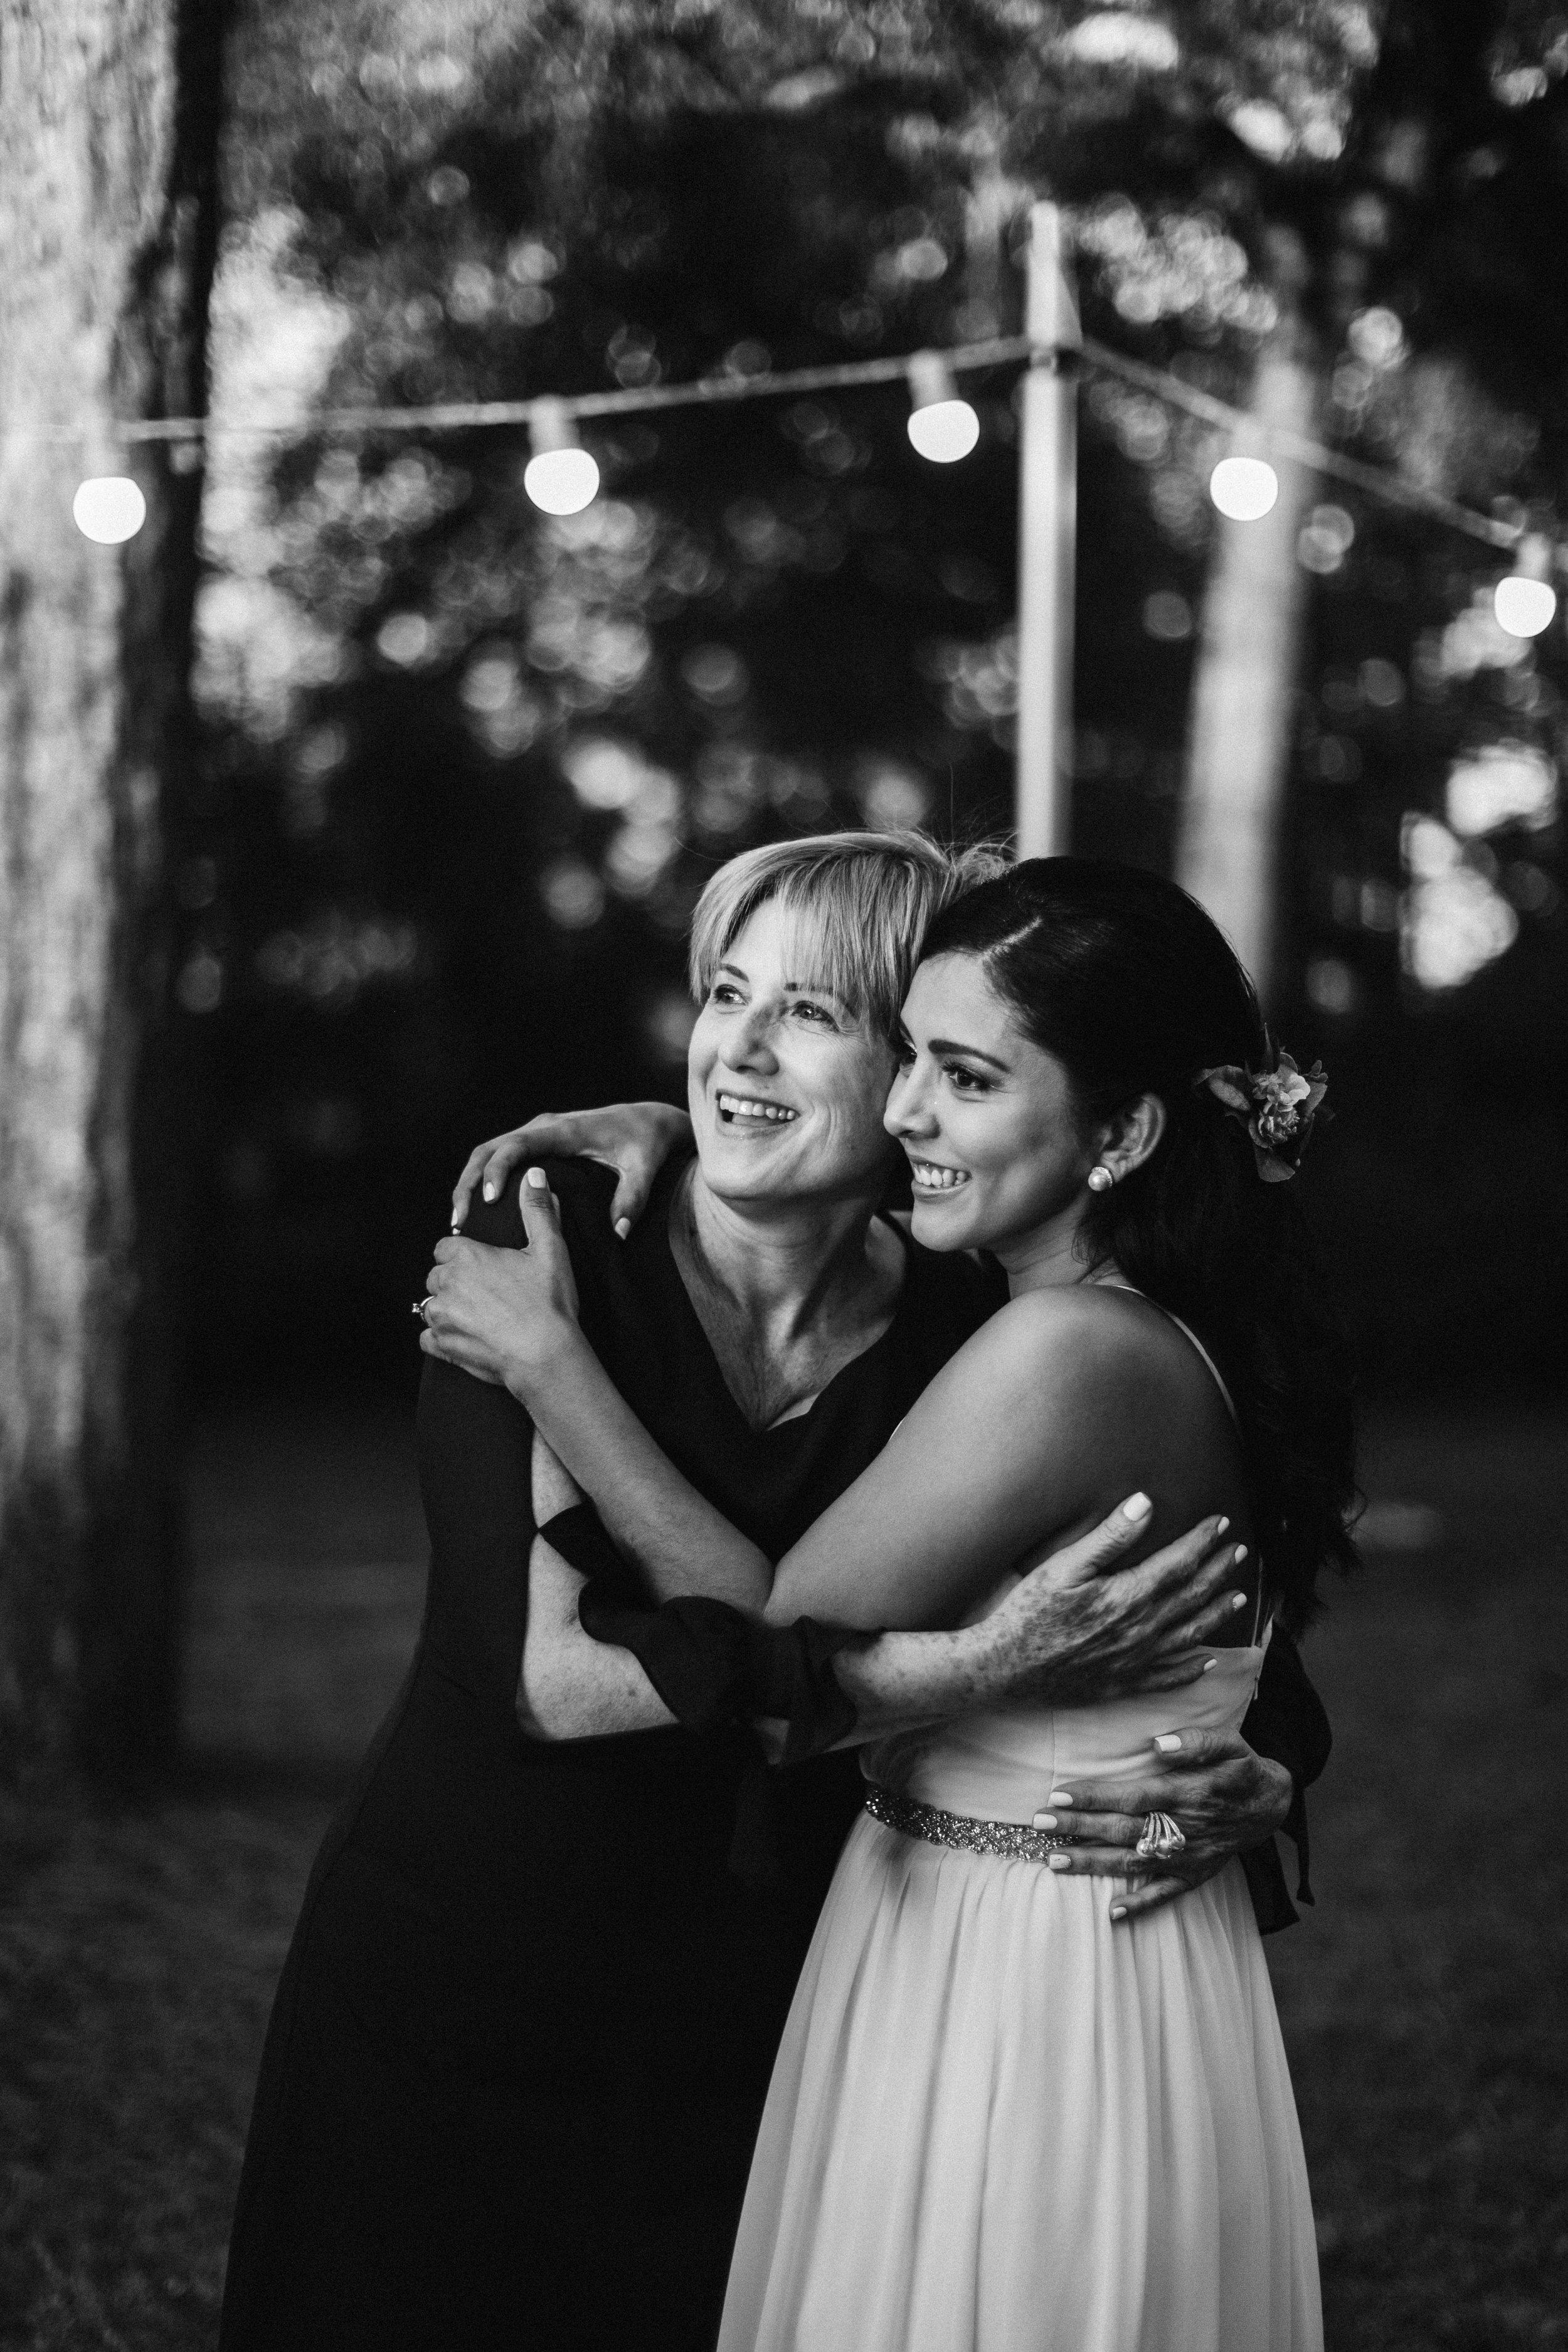 2018.11.03 Jael and Edel Ocala Wedding FINALS (368 of 441).jpg